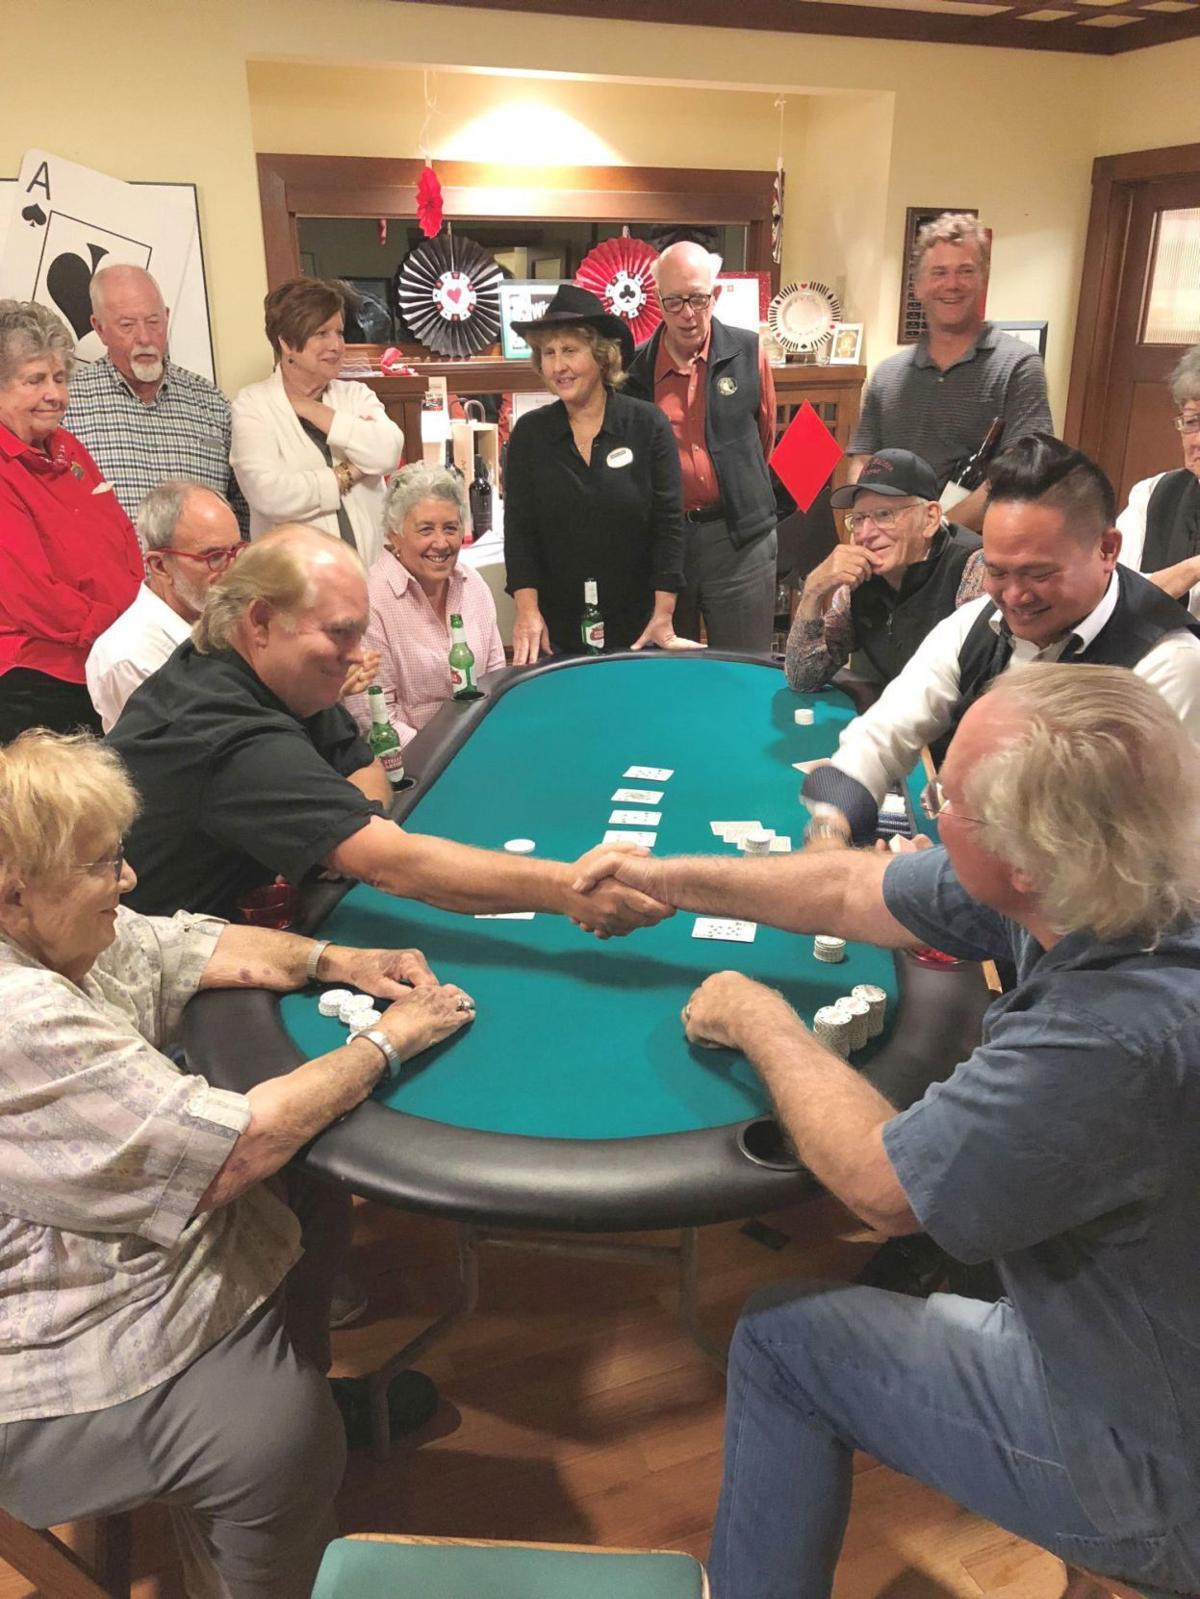 Handshake at poker table